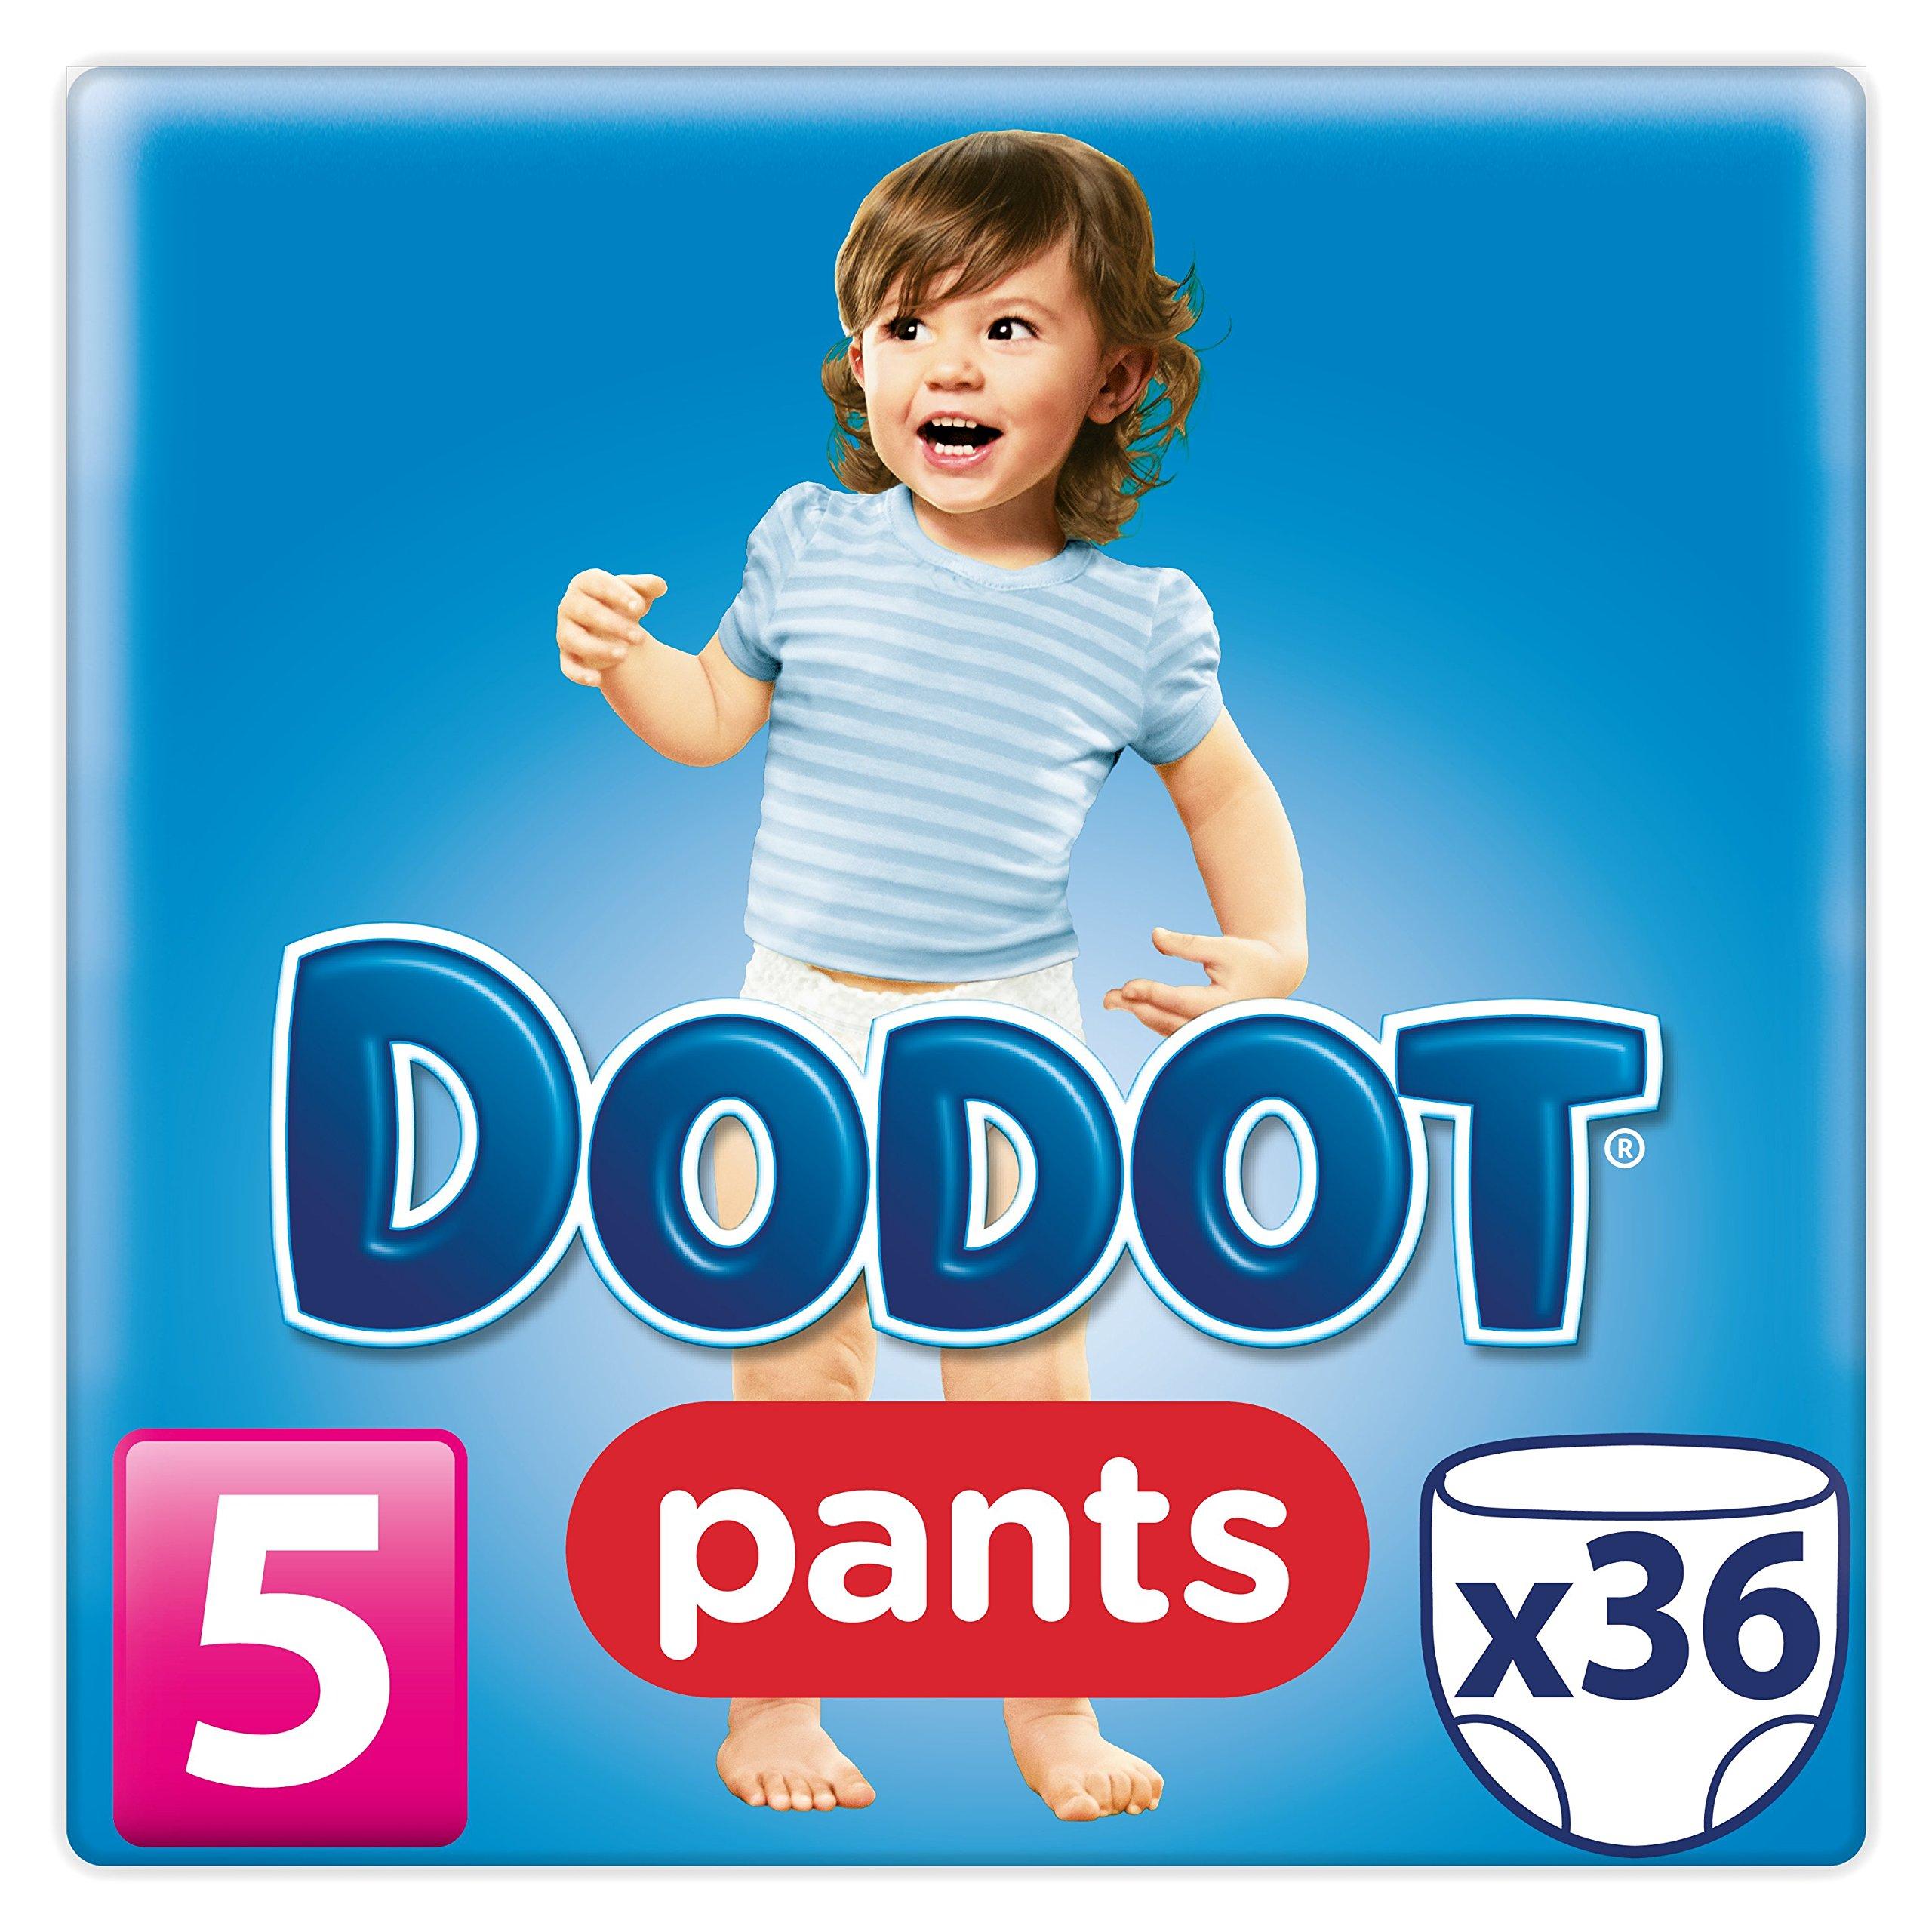 Dodot Pants - Pack 36 pañales, talla 5, 12-18 kg: Amazon.es: Salud ...